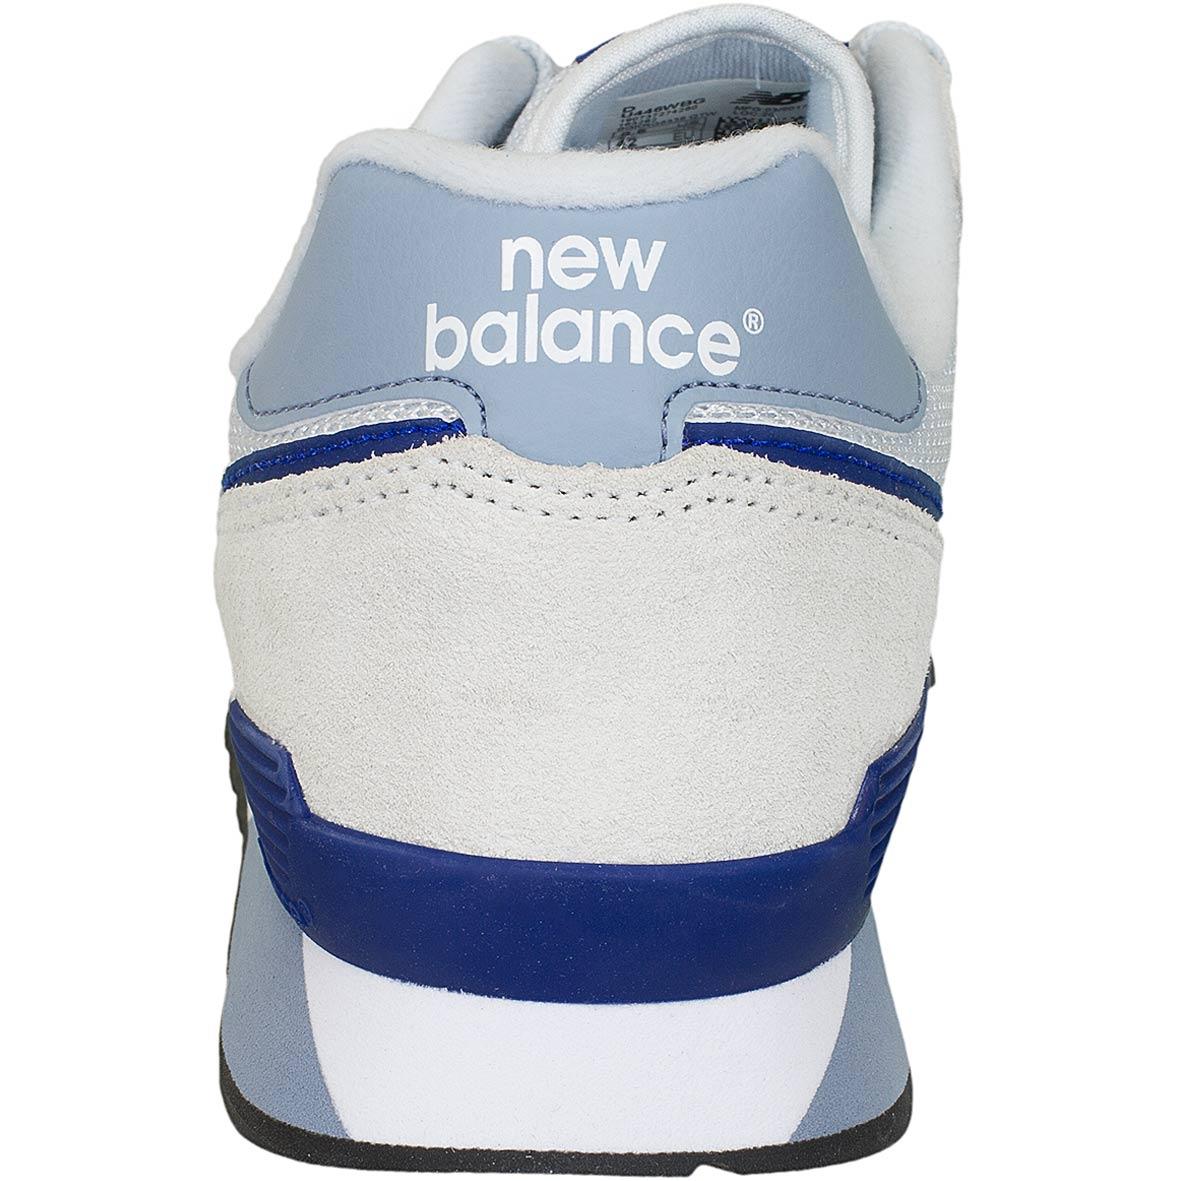 new balance sneaker u446 d wei blau hier bestellen. Black Bedroom Furniture Sets. Home Design Ideas